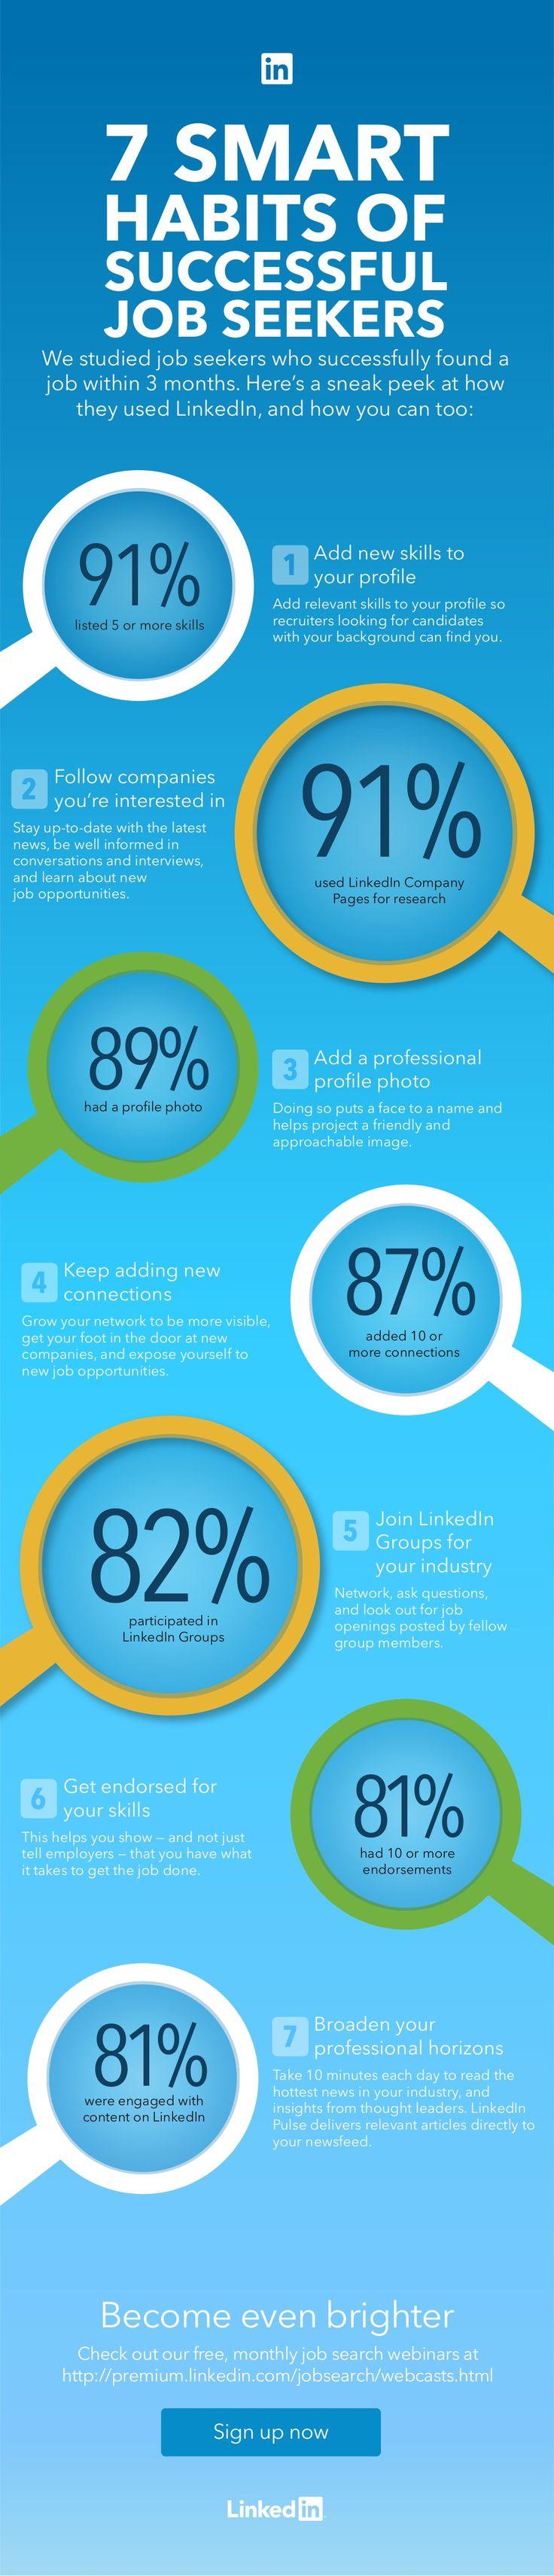 7 Smart Habits of Successful Job Seekers by LinkedIn via slideshare